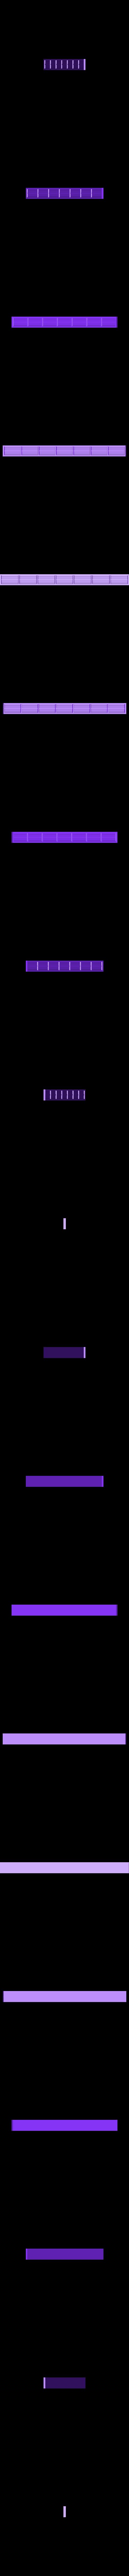 G Ridelle1.STL Download STL file Draisine Matisa for LGB • 3D printable object, biddle